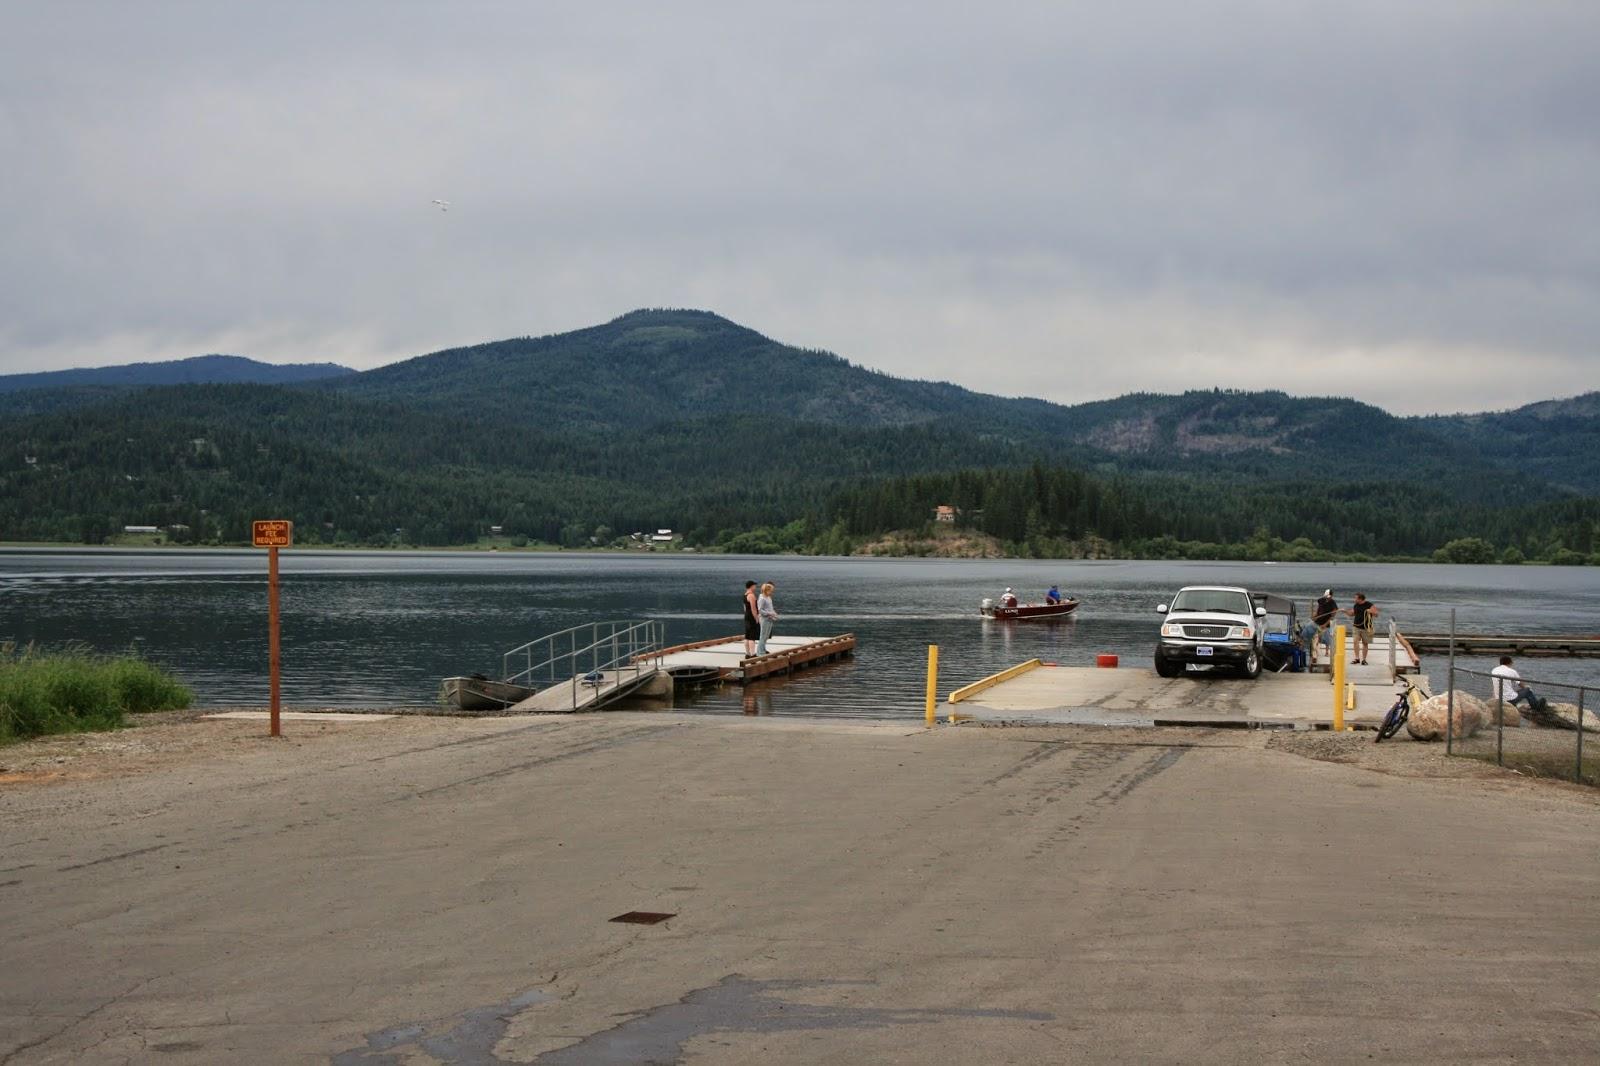 BOATING THE INLAND NORTHWEST: Hauser Lake, Kootenai County ...